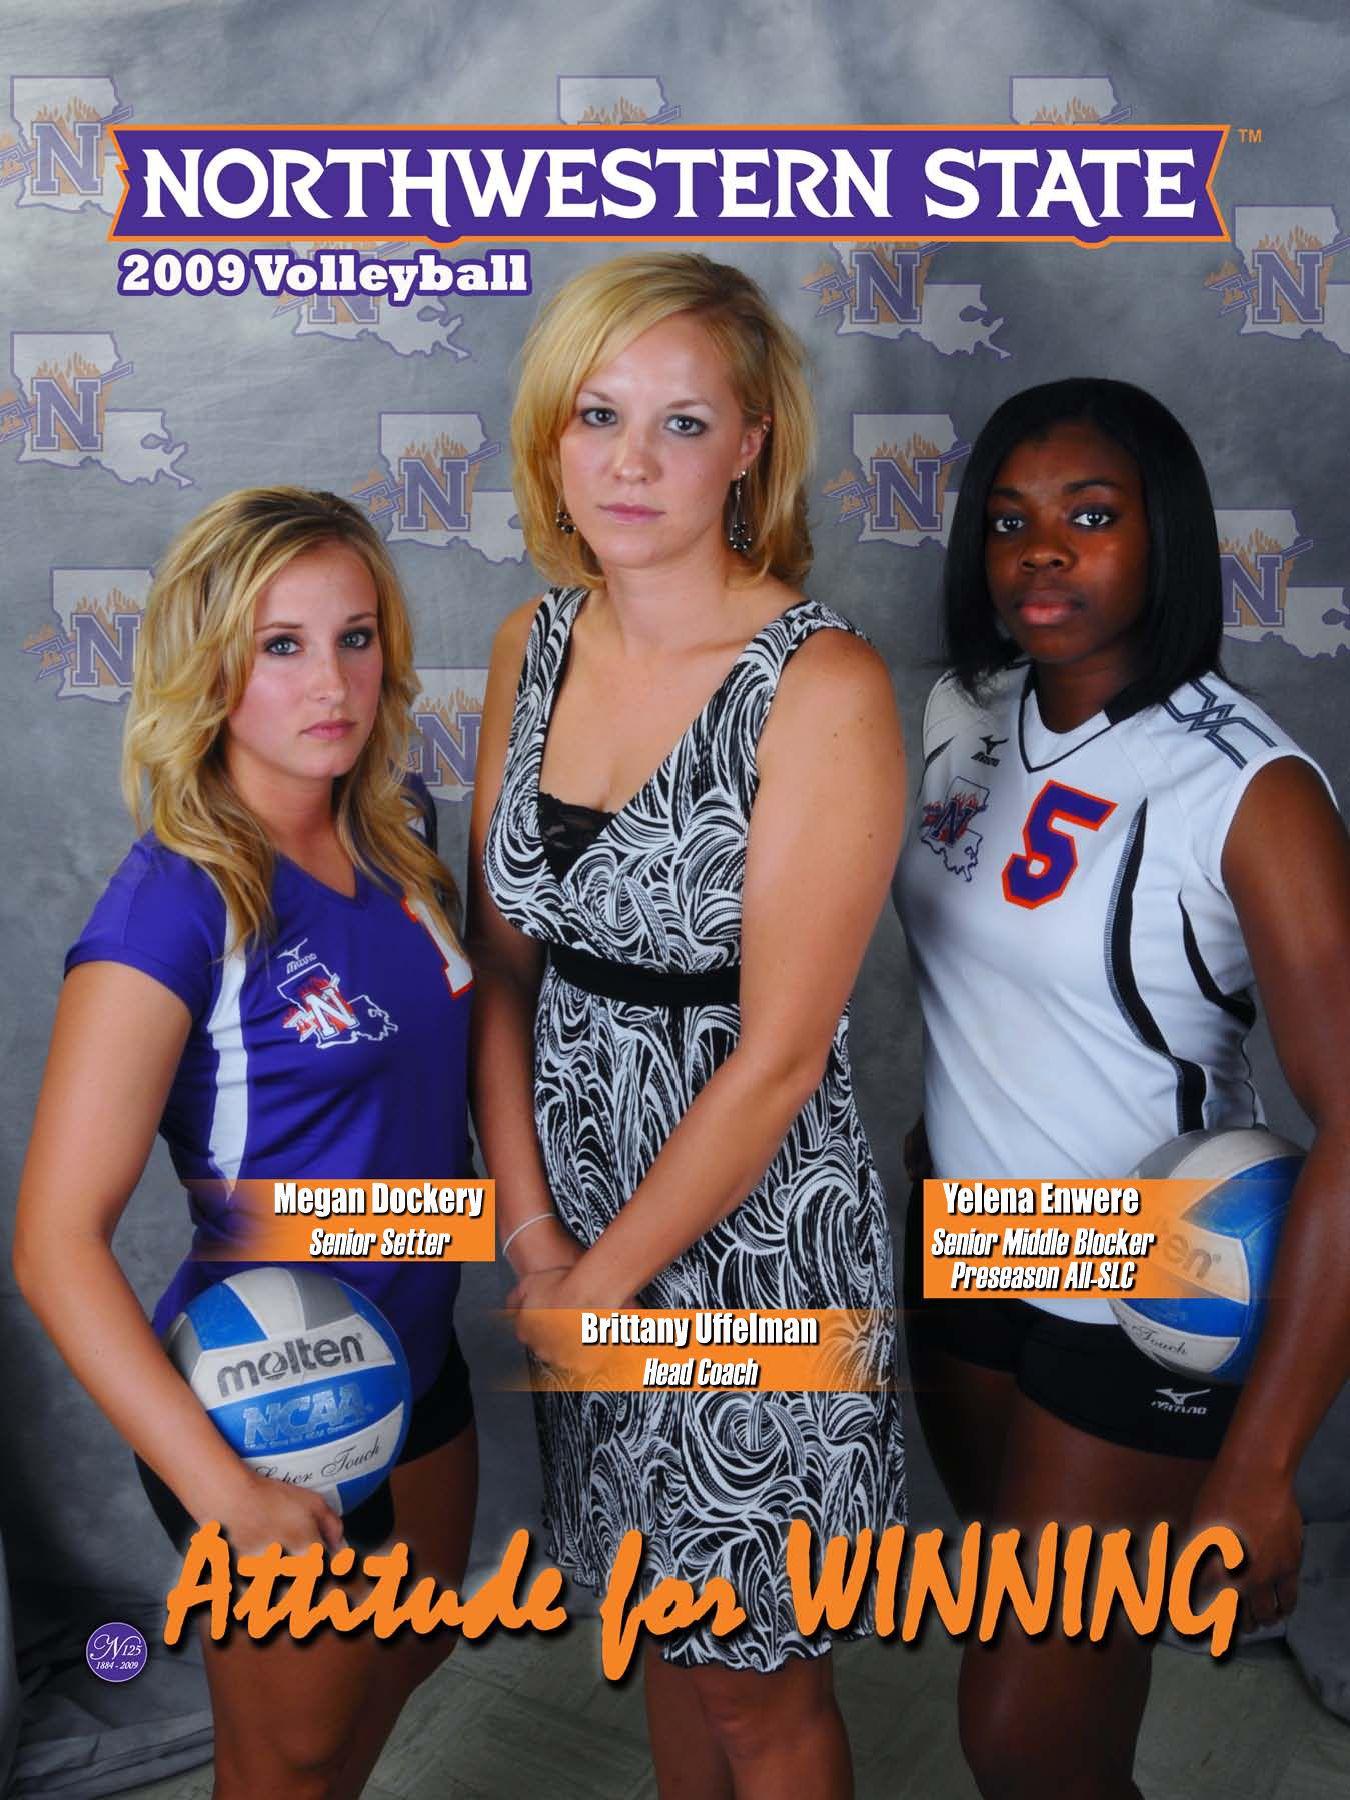 Randy Johnson Daughter Volleyball